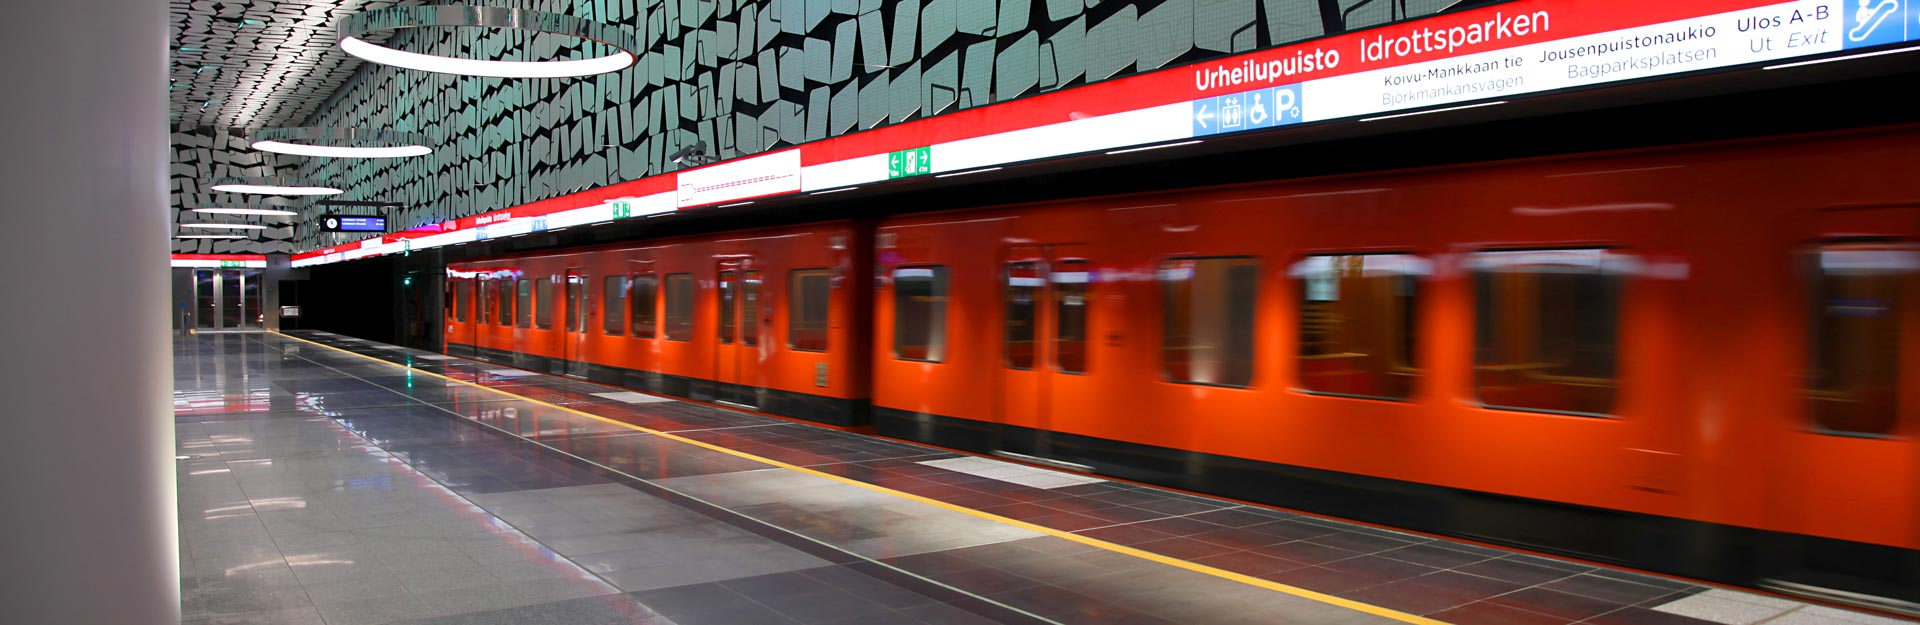 Urheilupuiston metroasema